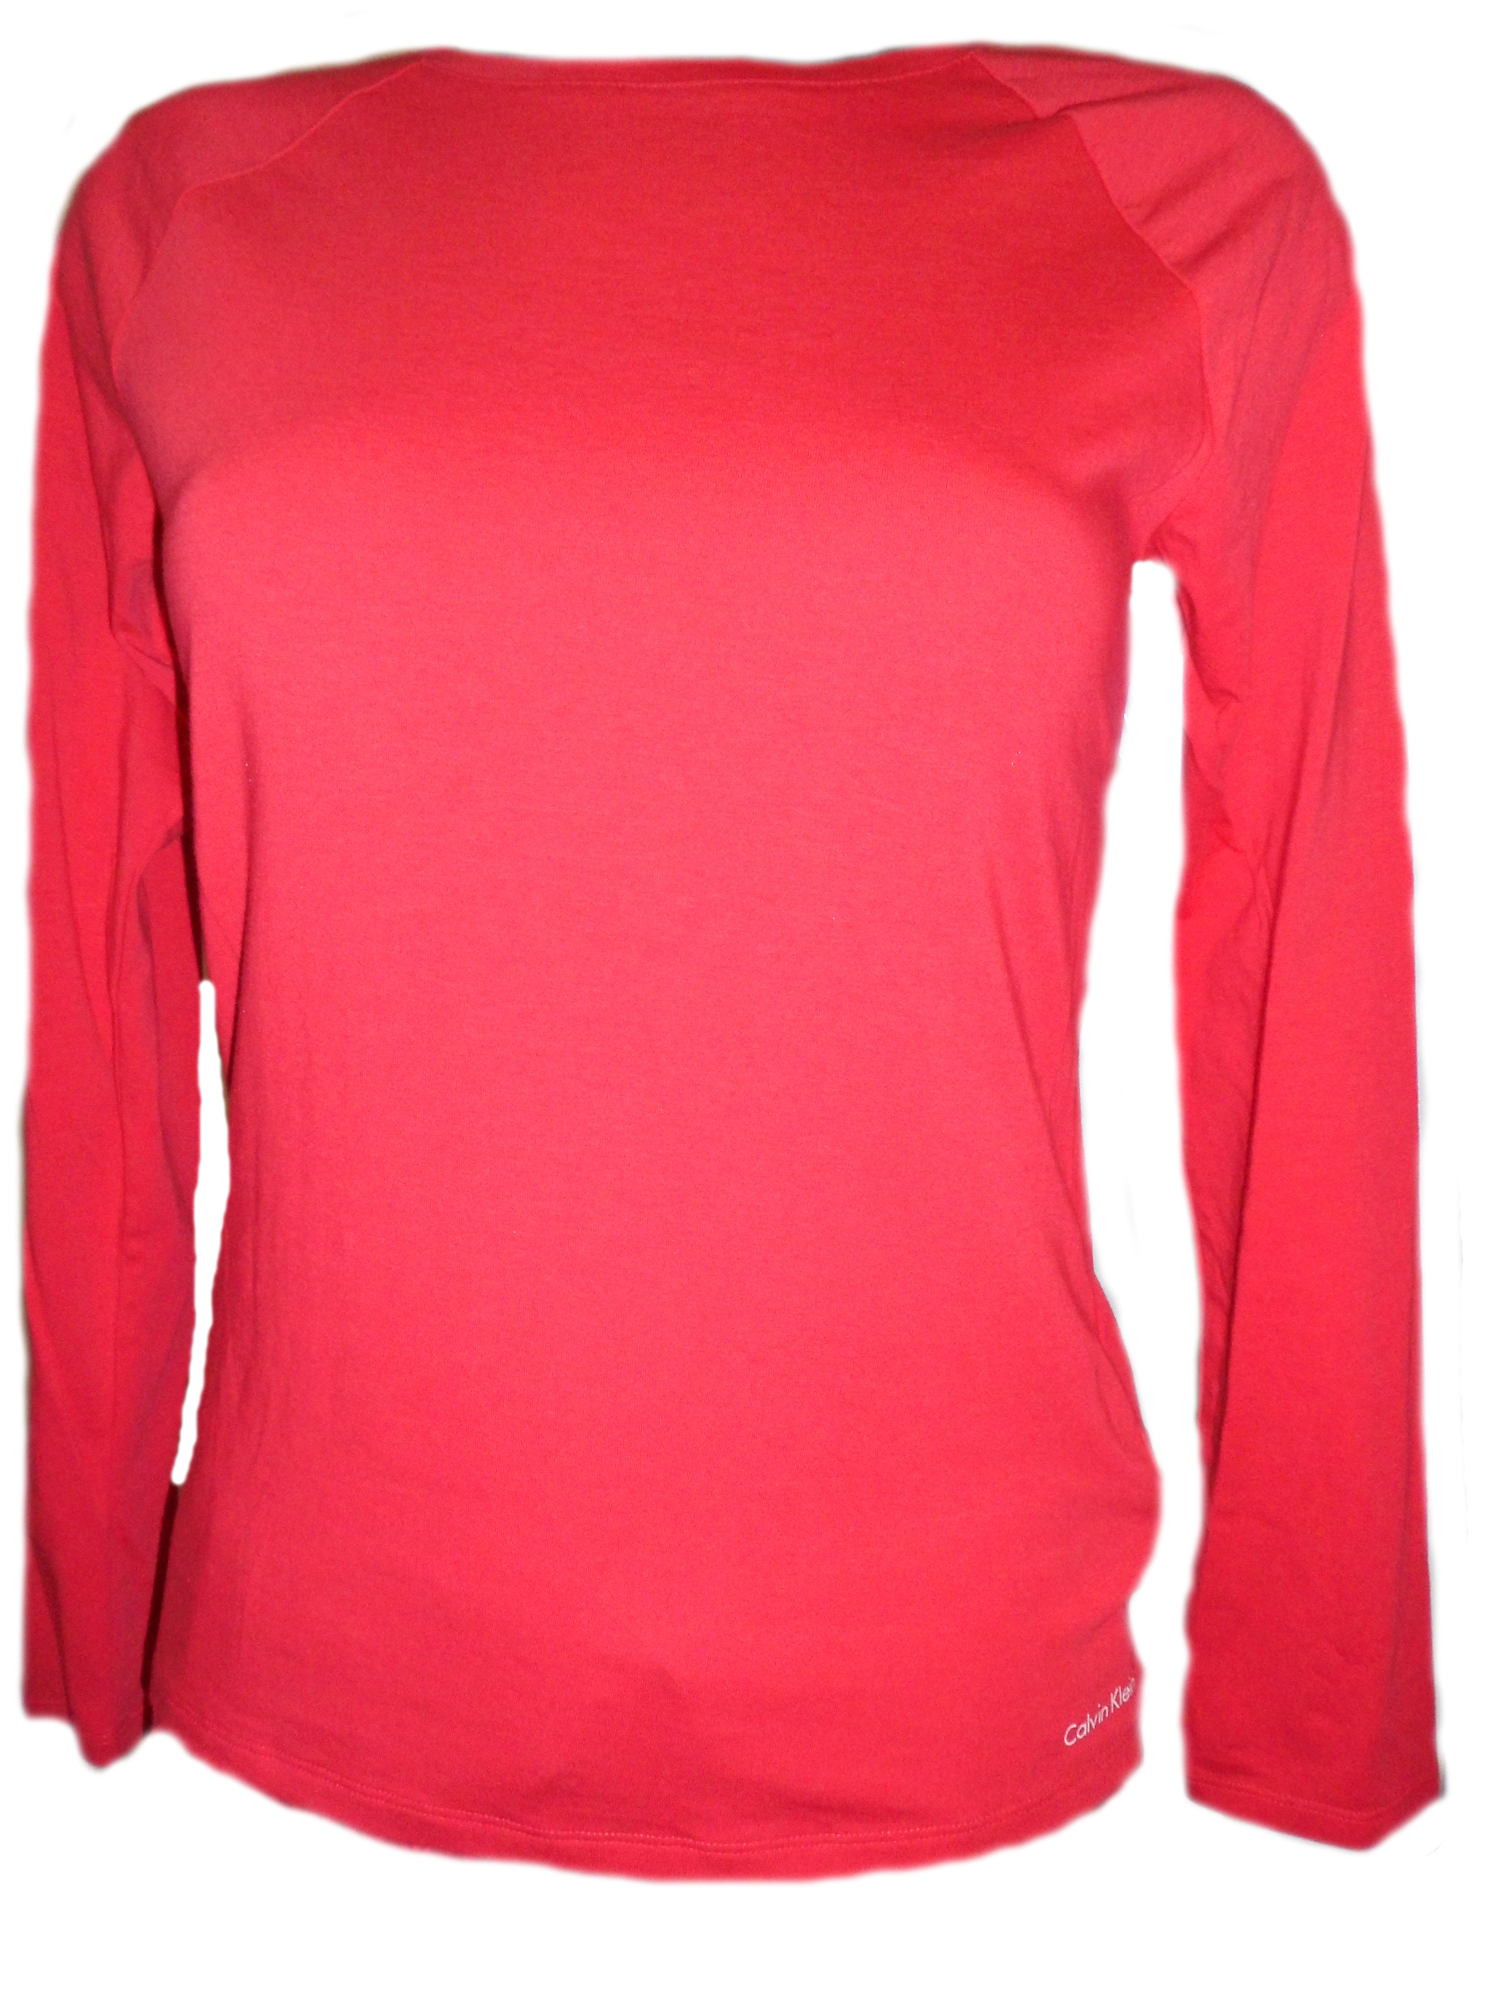 Dámské triko DR QS5320E - Calvin Klein Barva: červená, Velikost: L